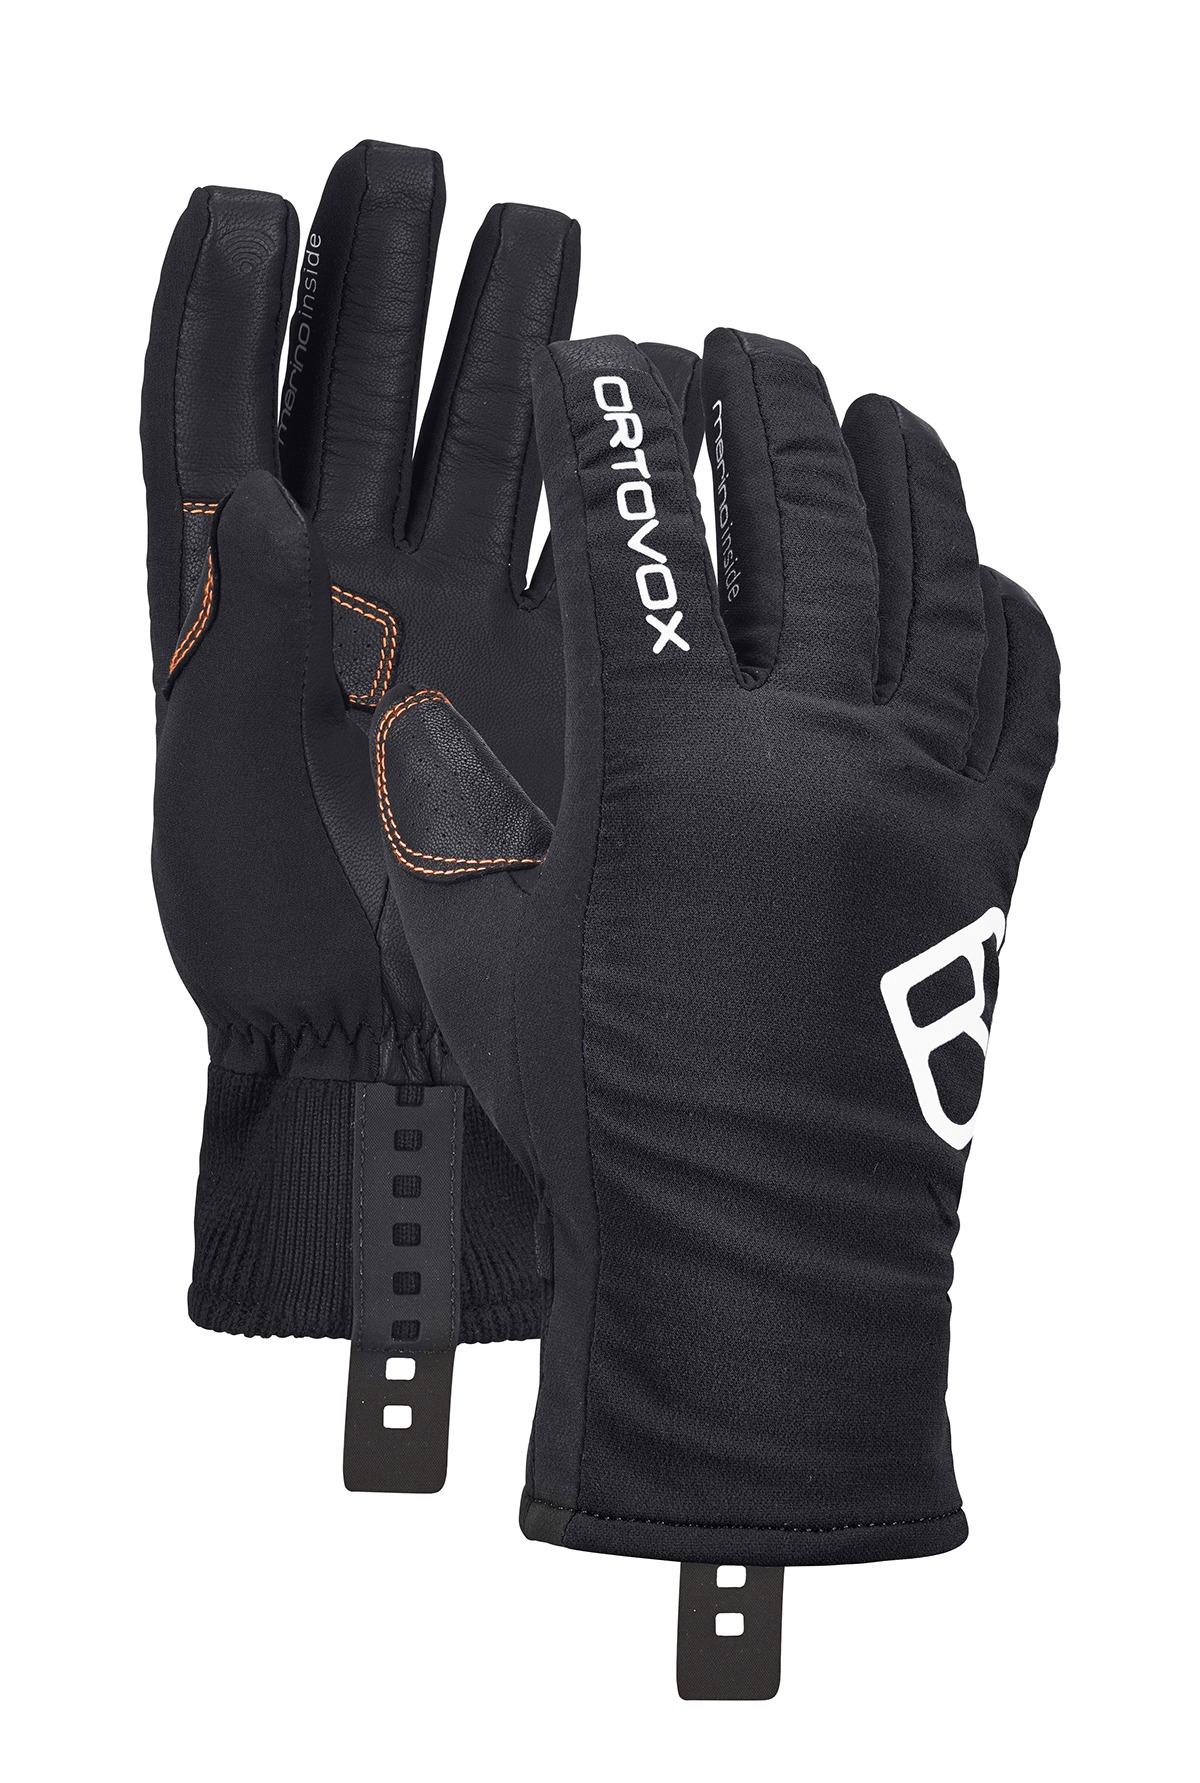 Ortovox Men's Tour Glove - Black Raven